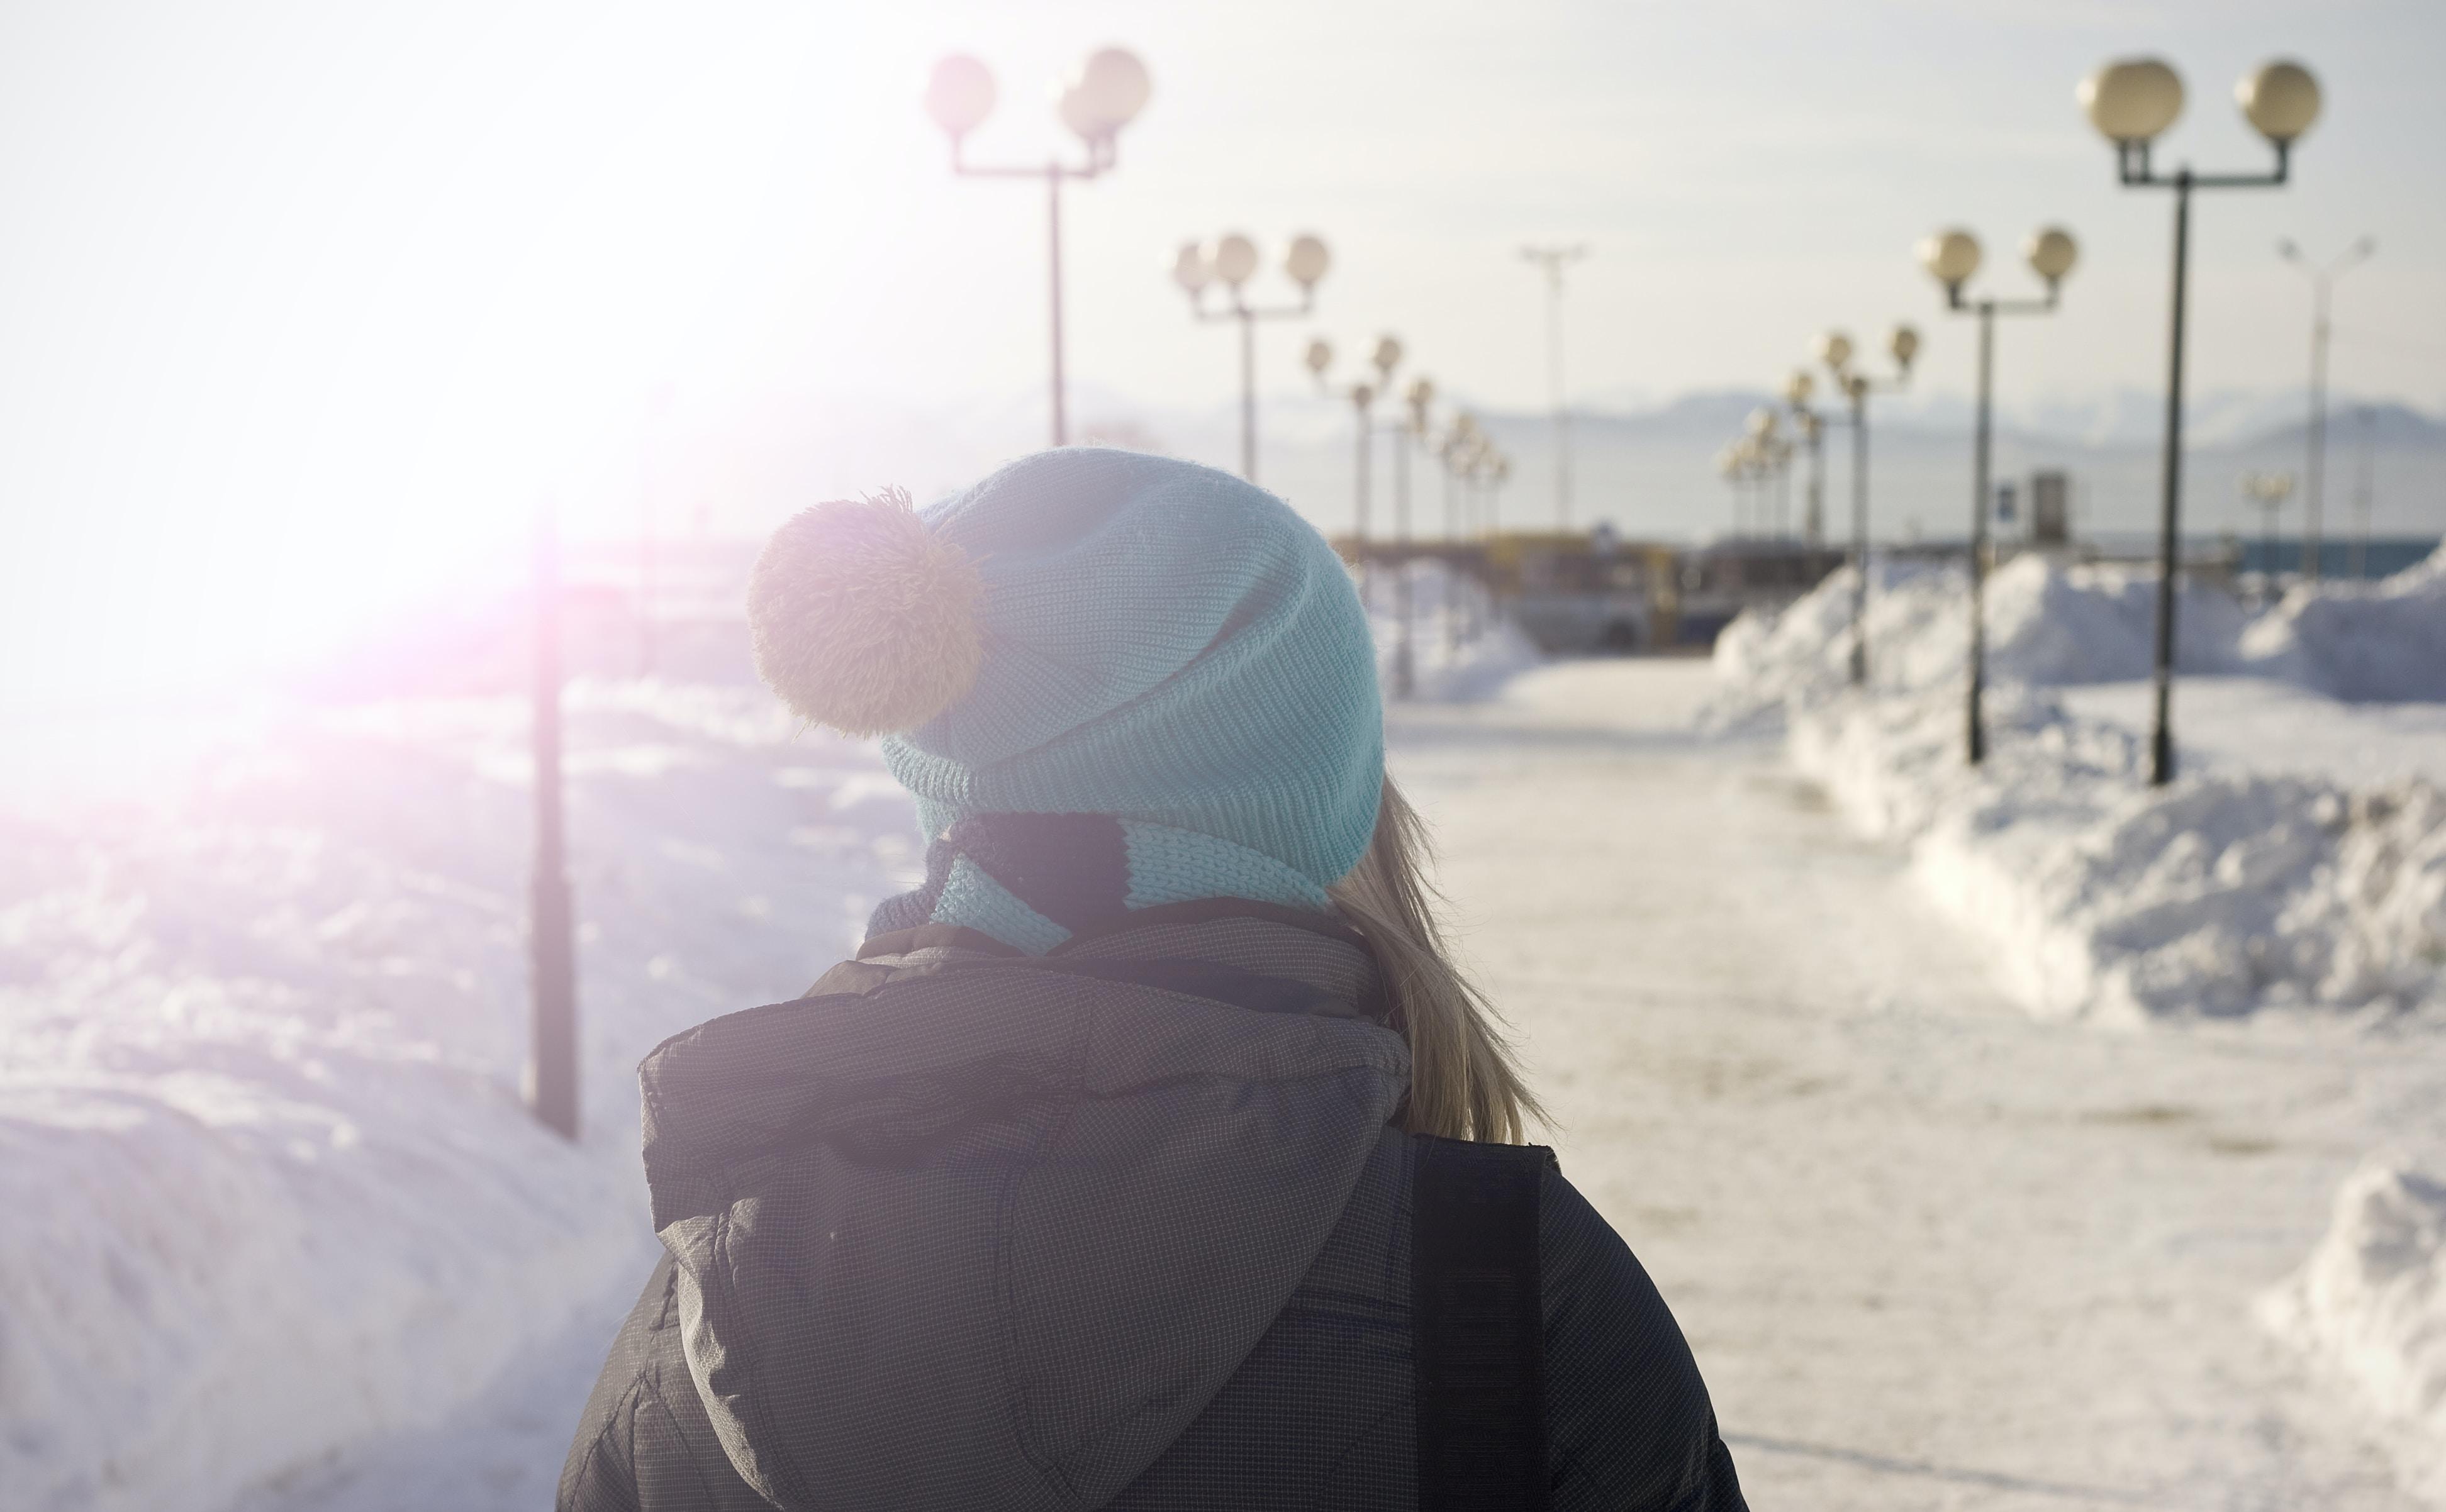 A female in a blue hat walking a snowy path of streetlights in the sun